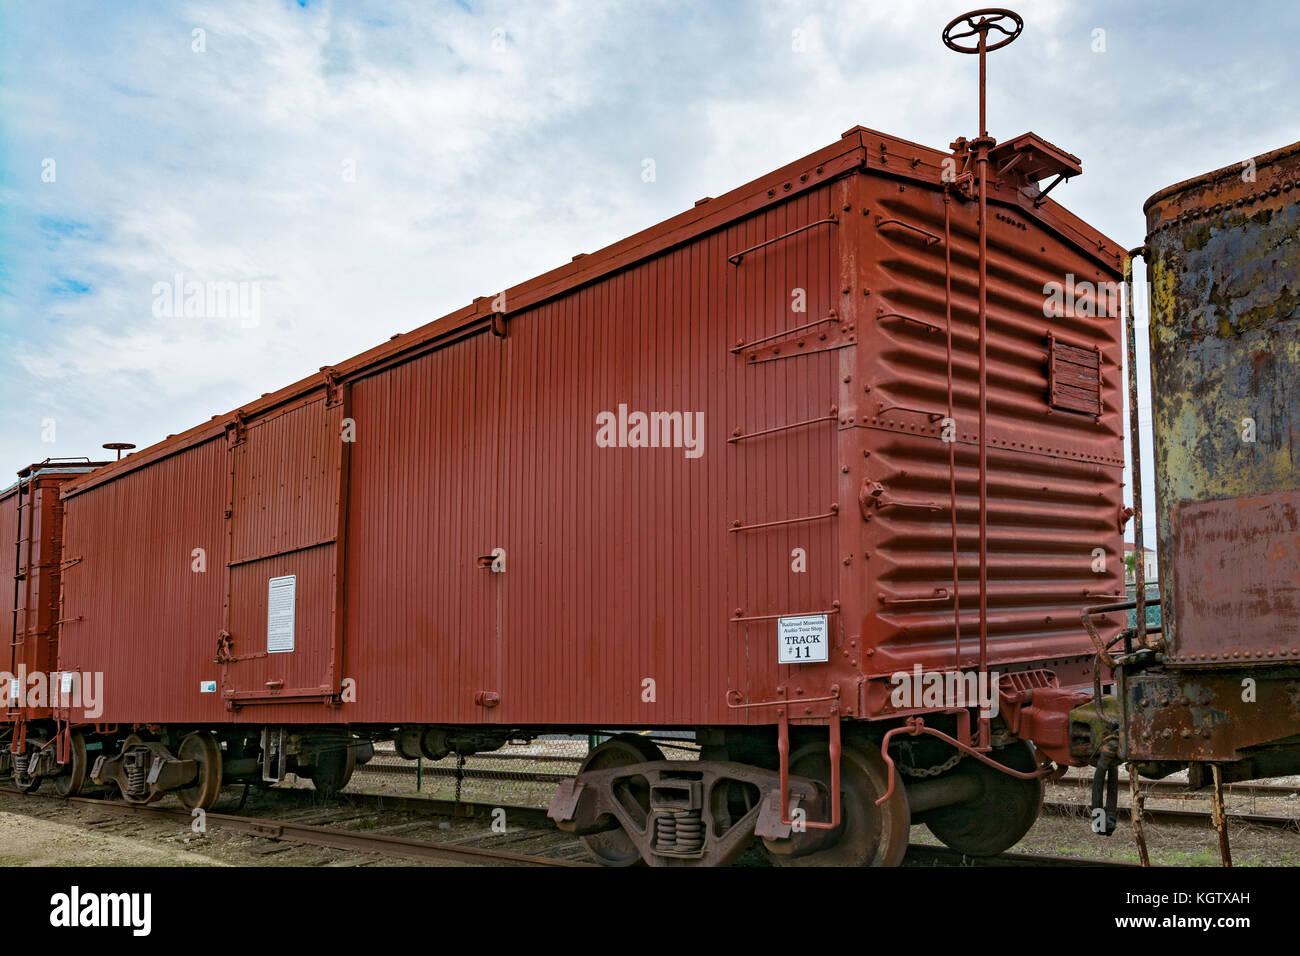 Texas, Galveston Railroad Museum, D&RGW Box Car #62746, built 1909, rare 36-foot long version, one of 1500 built - Stock Image